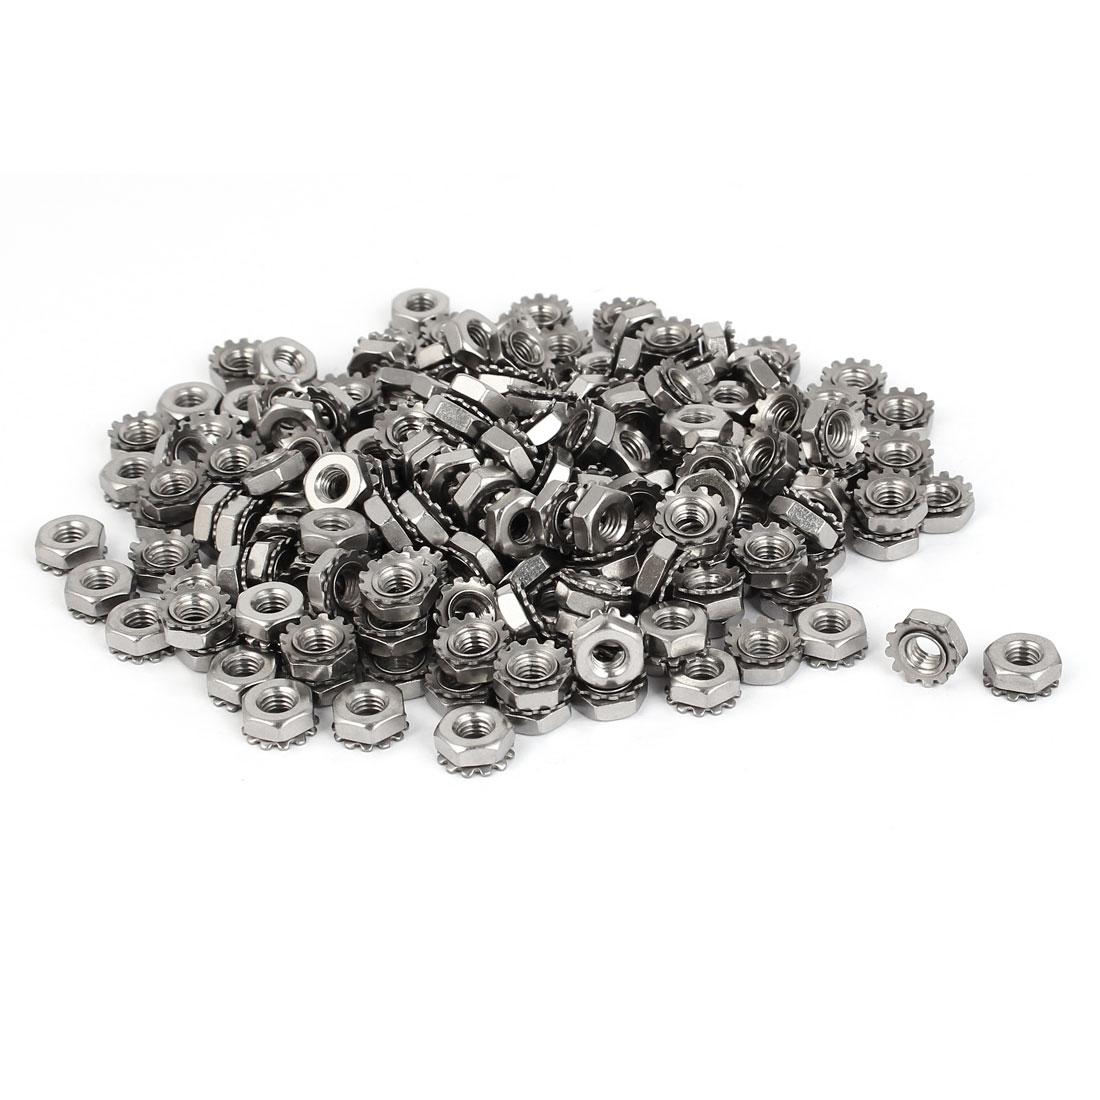 10#-32 304 Stainless Steel Female Thread Kep Hex Head Lock Nut 200pcs